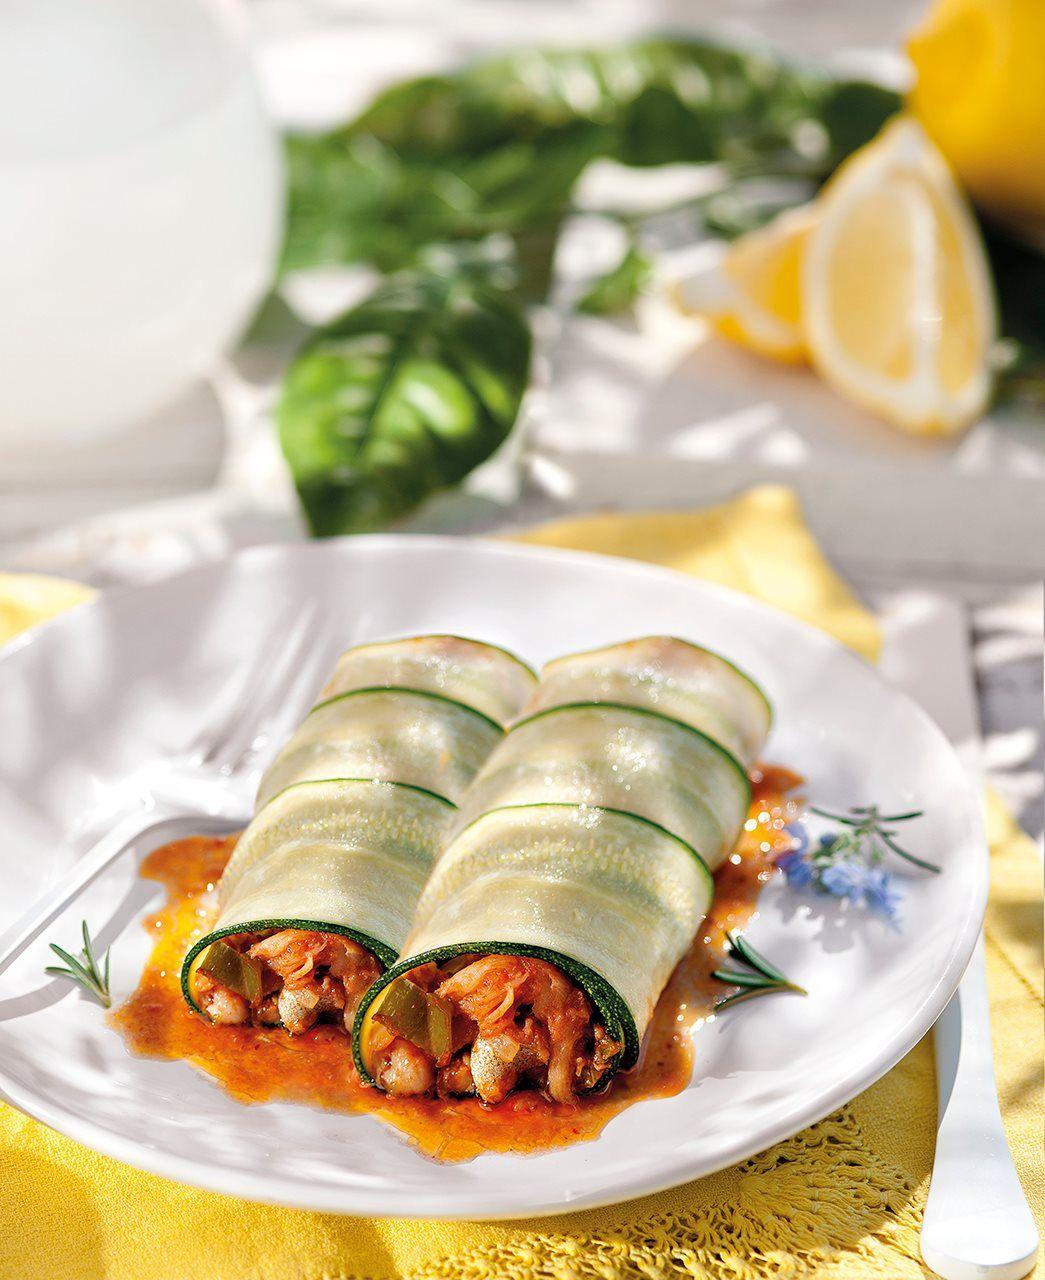 recetas de comida dieta mediterranea